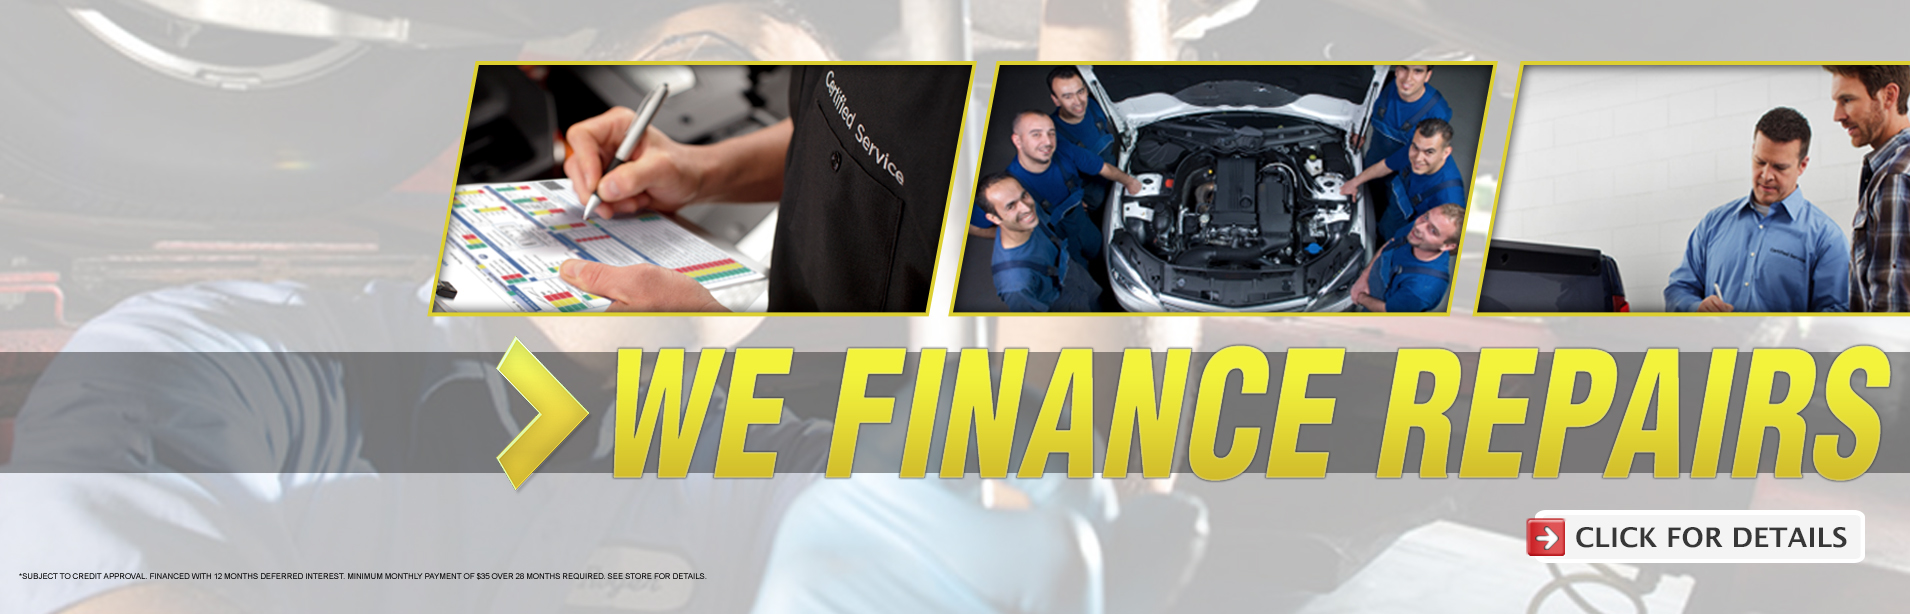 We Finance Repairs - Bay Automotive - Norfolk VA